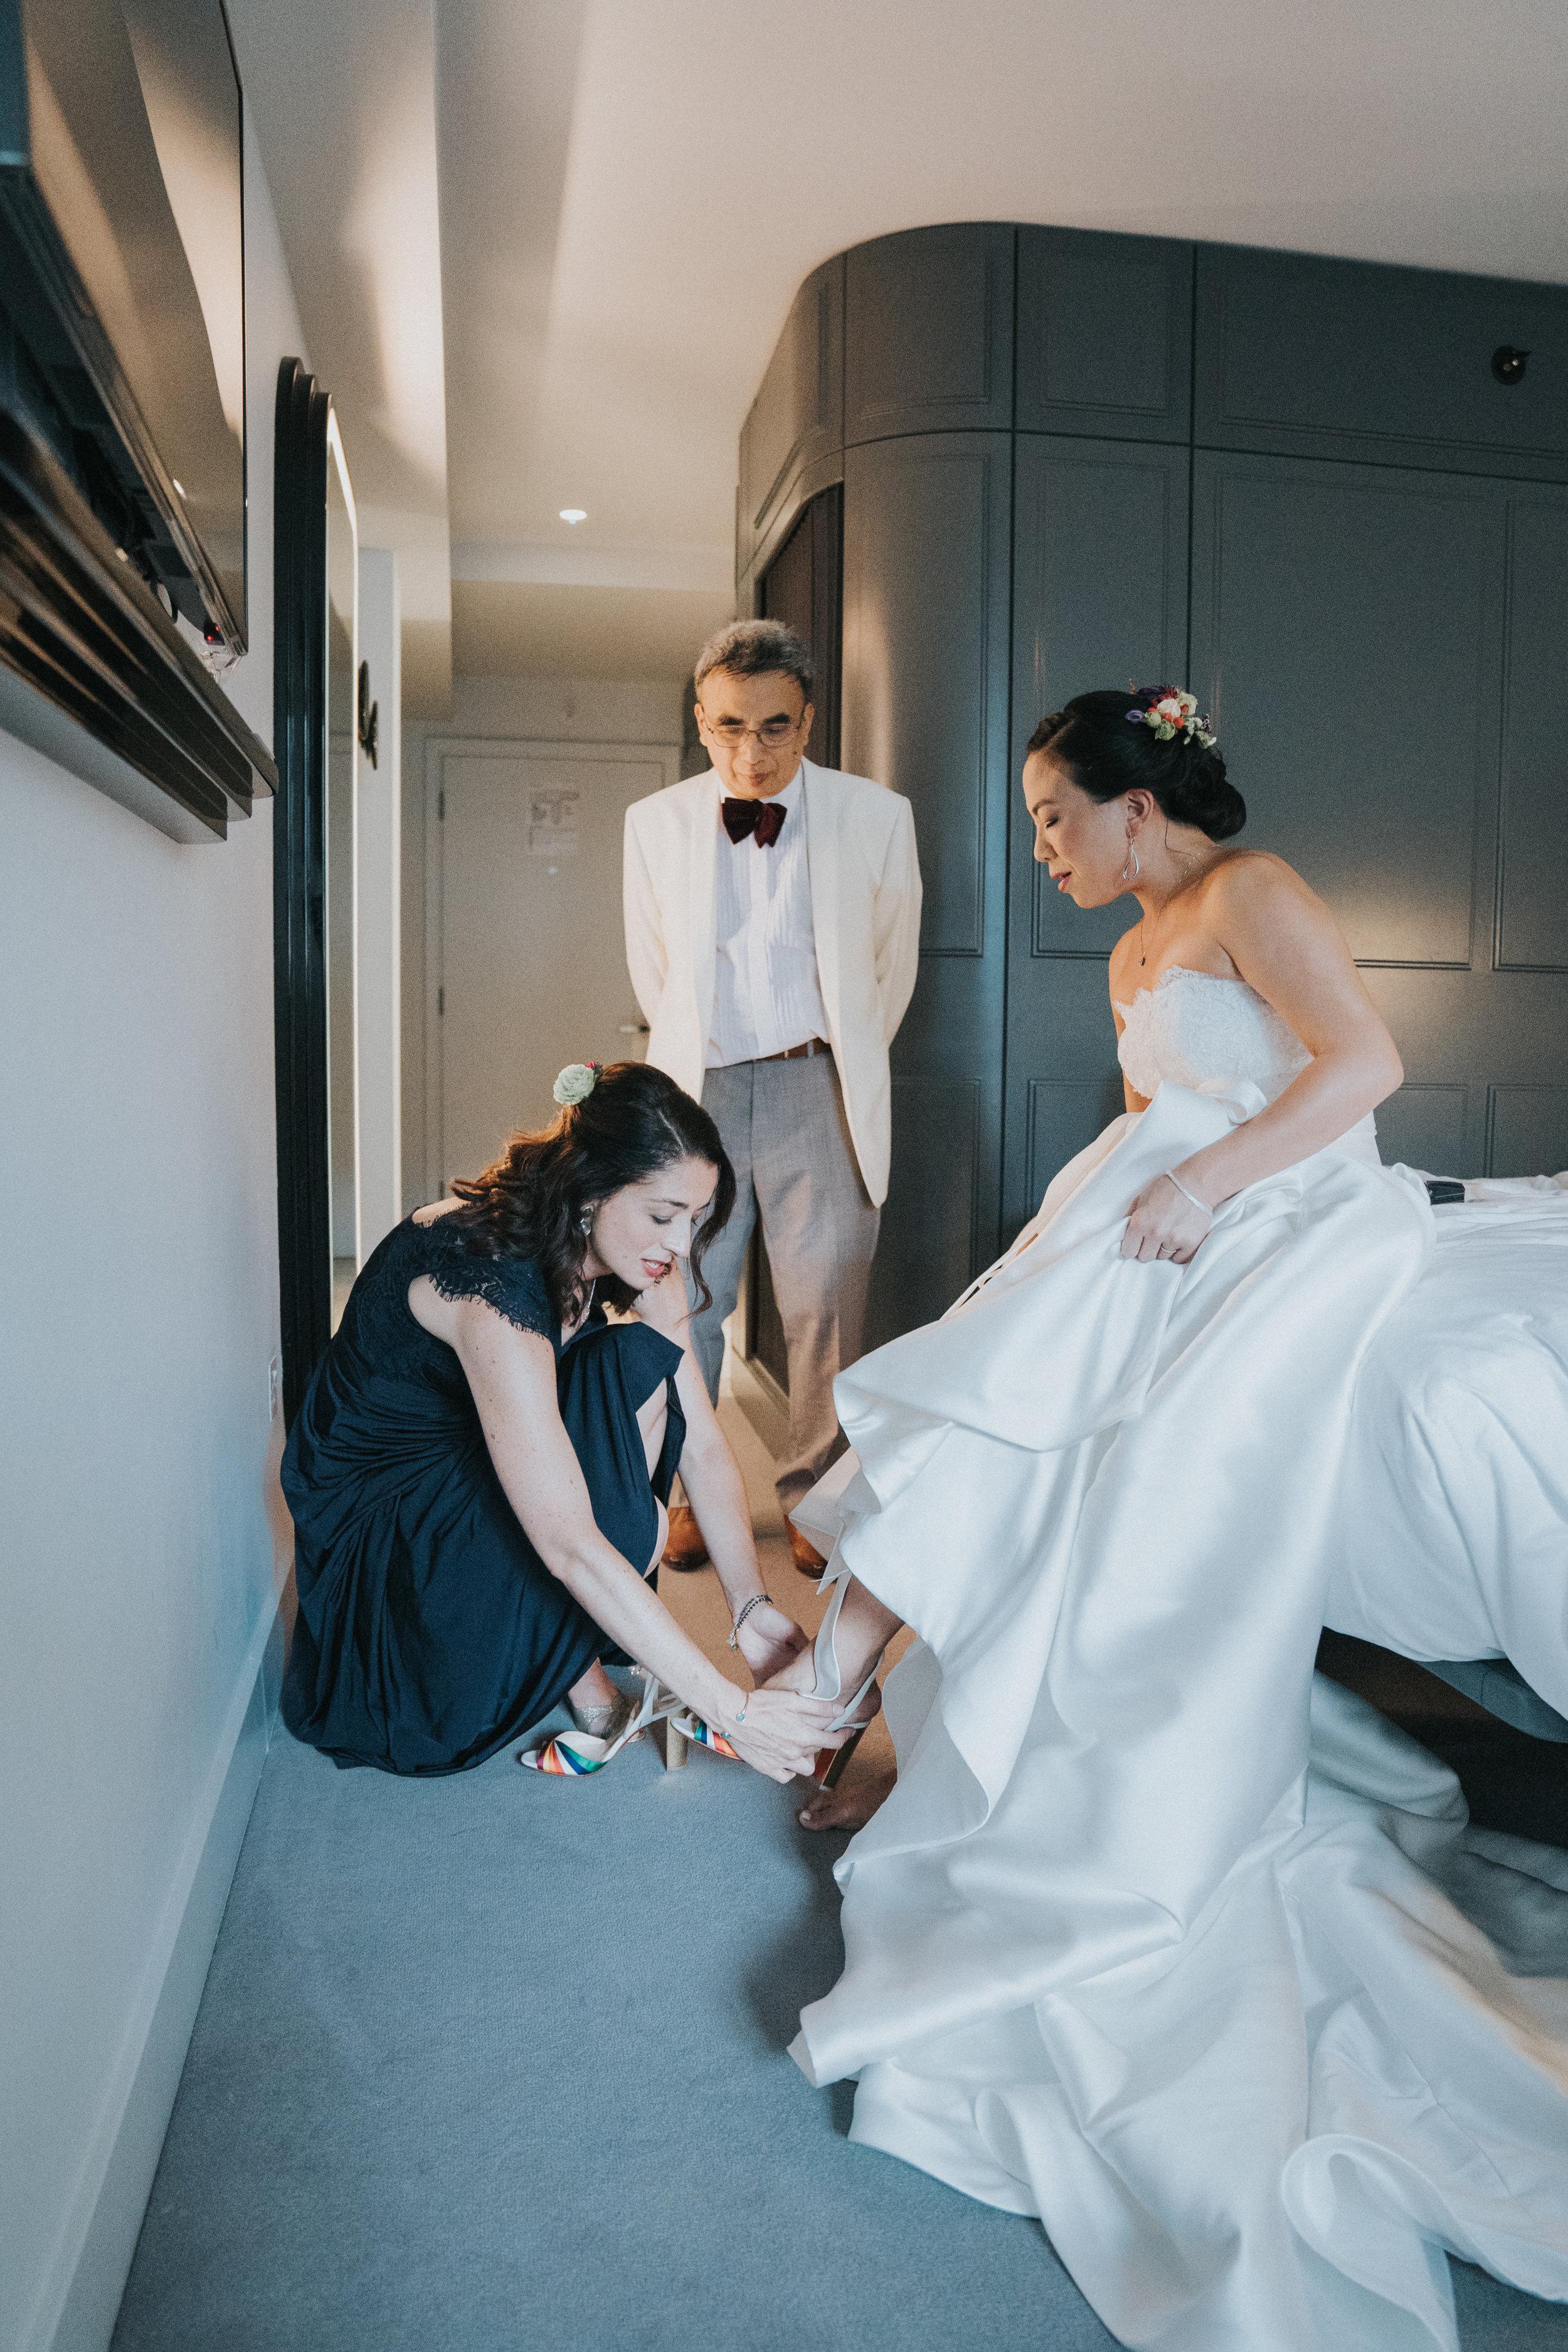 river-rooms-blackfriars-london-stpauls-mondrian-hotel-wedding-photography-videography-19